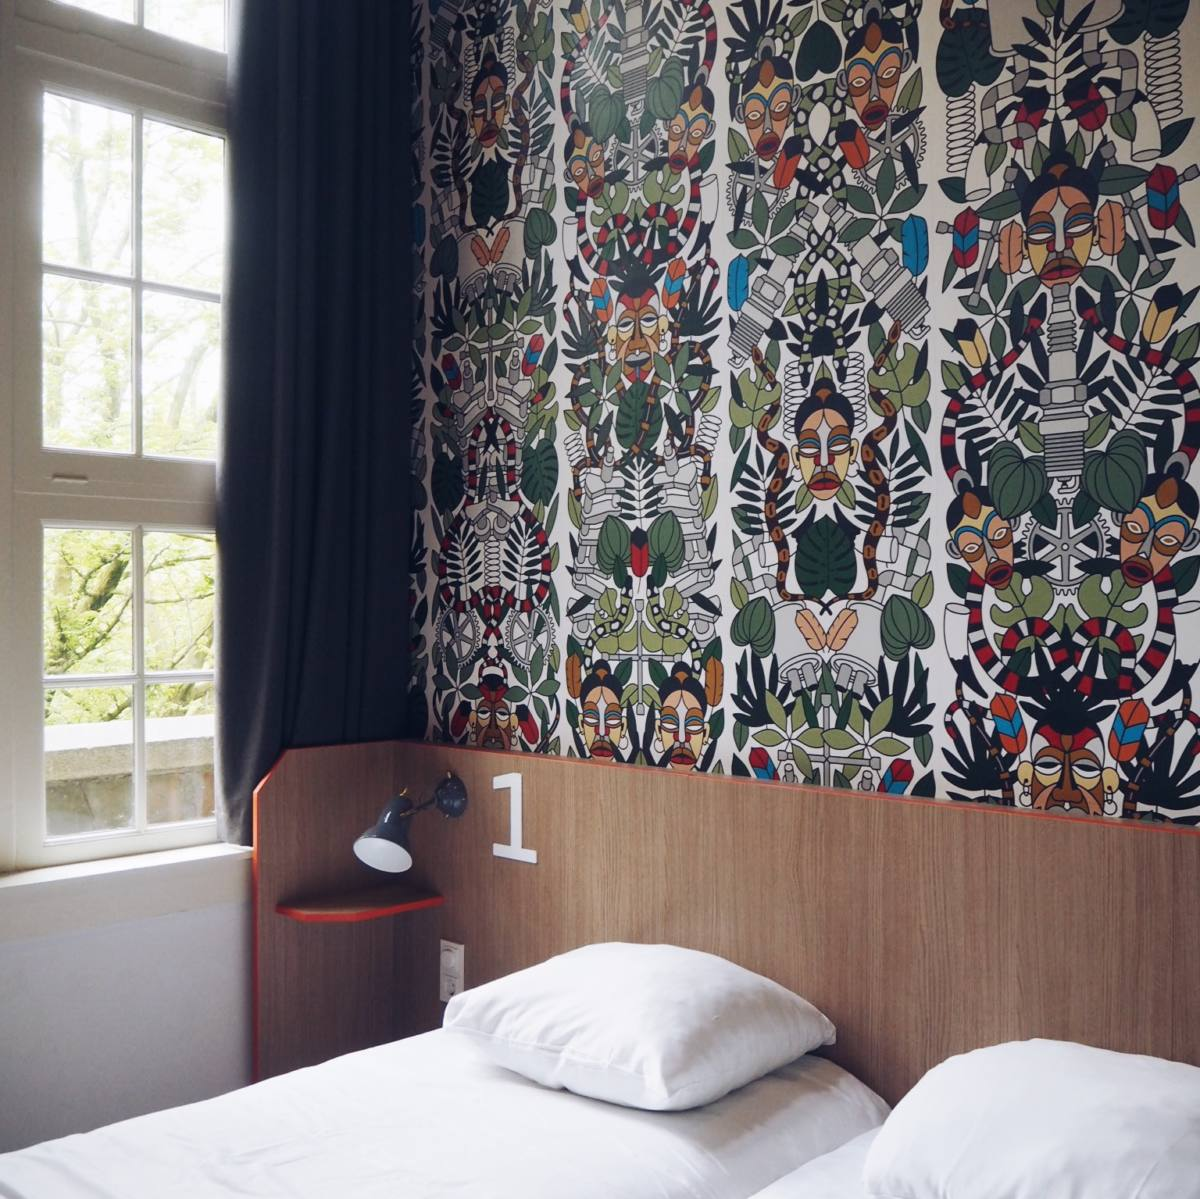 amsterdam city guide generator hostel